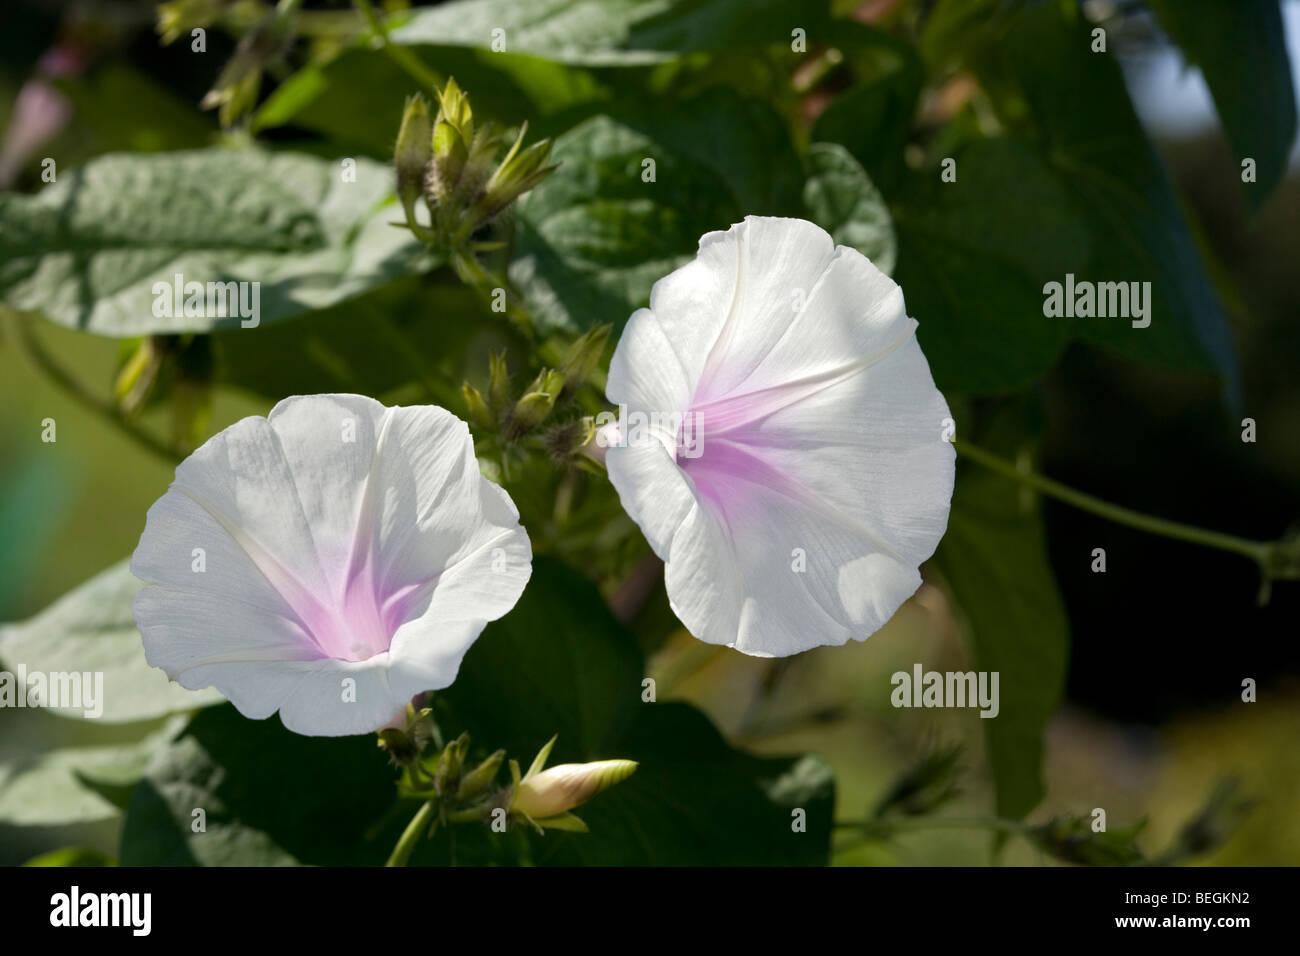 Common Morning Glory, Purpurvinda (Ipomoea purpurea) Stock Photo